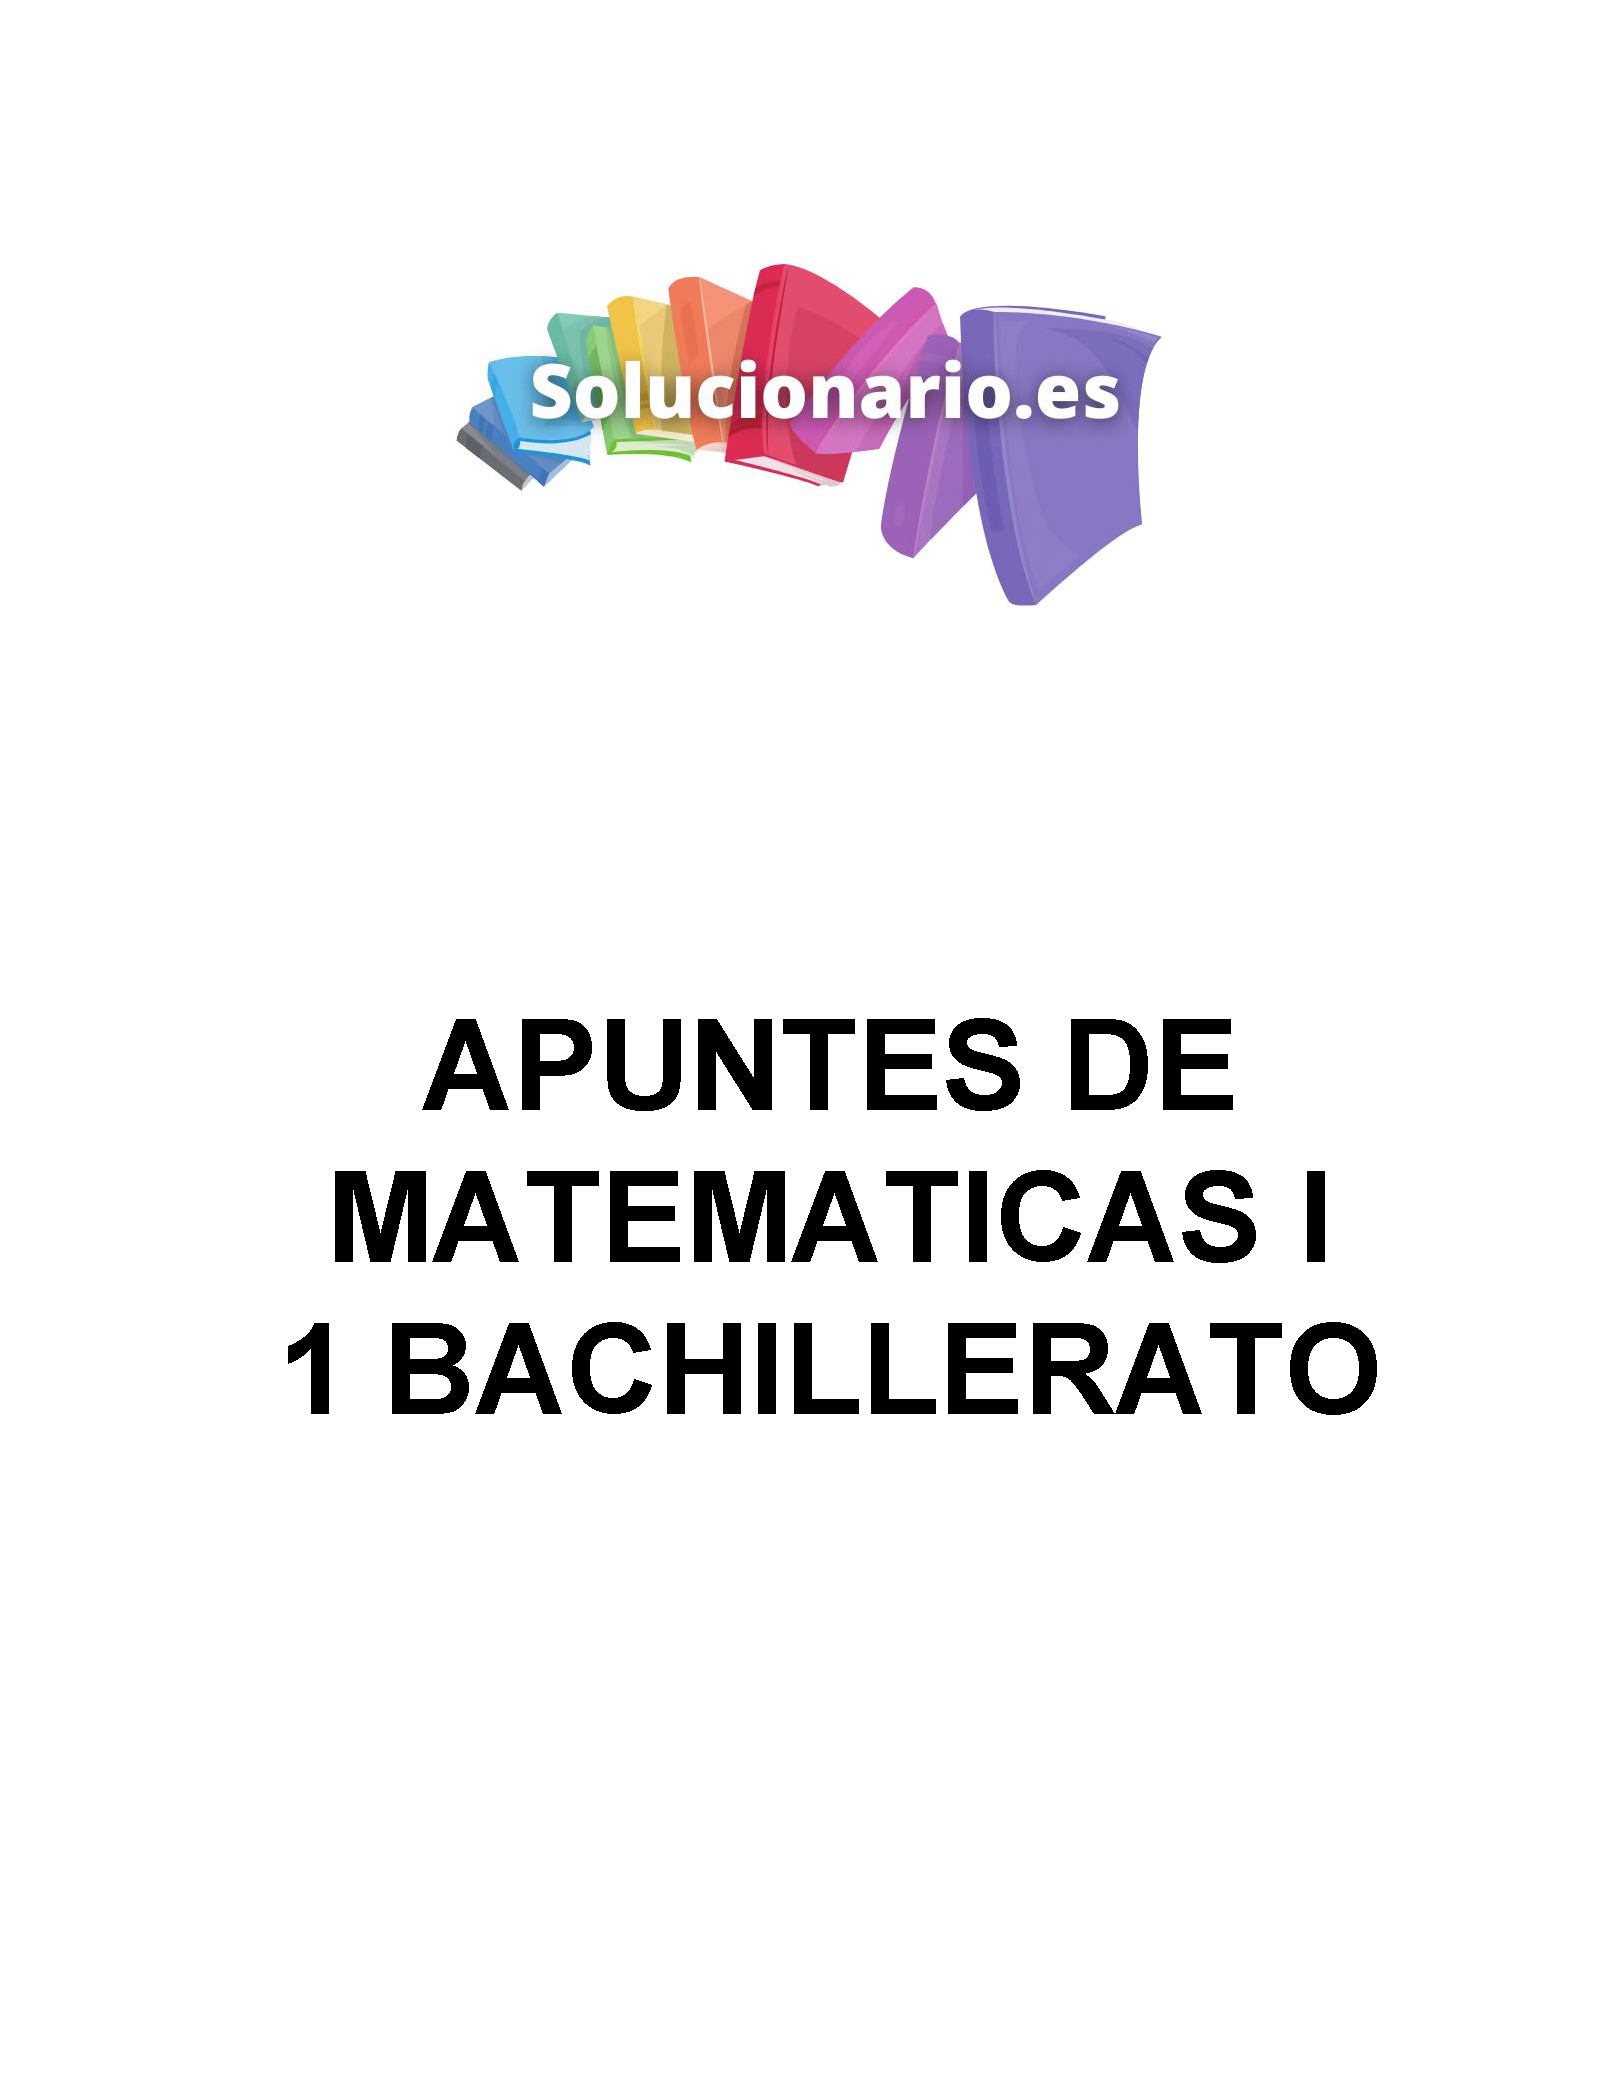 Apuntes Matemáticas Académicas Radicales 1 Bachillerato 2020 / 2021